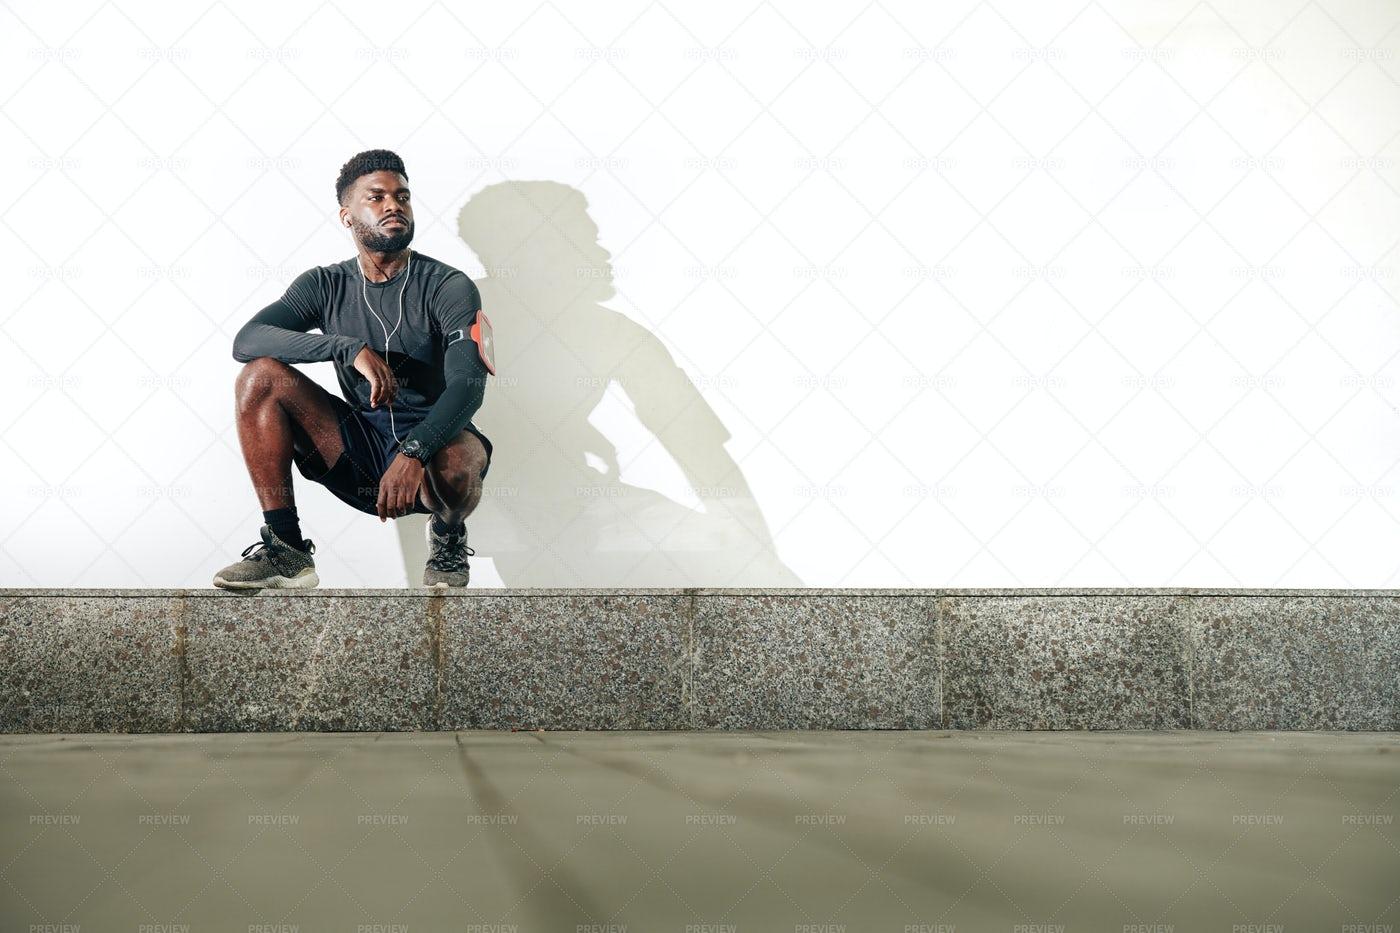 Sportsman Sitting On A Curb: Stock Photos